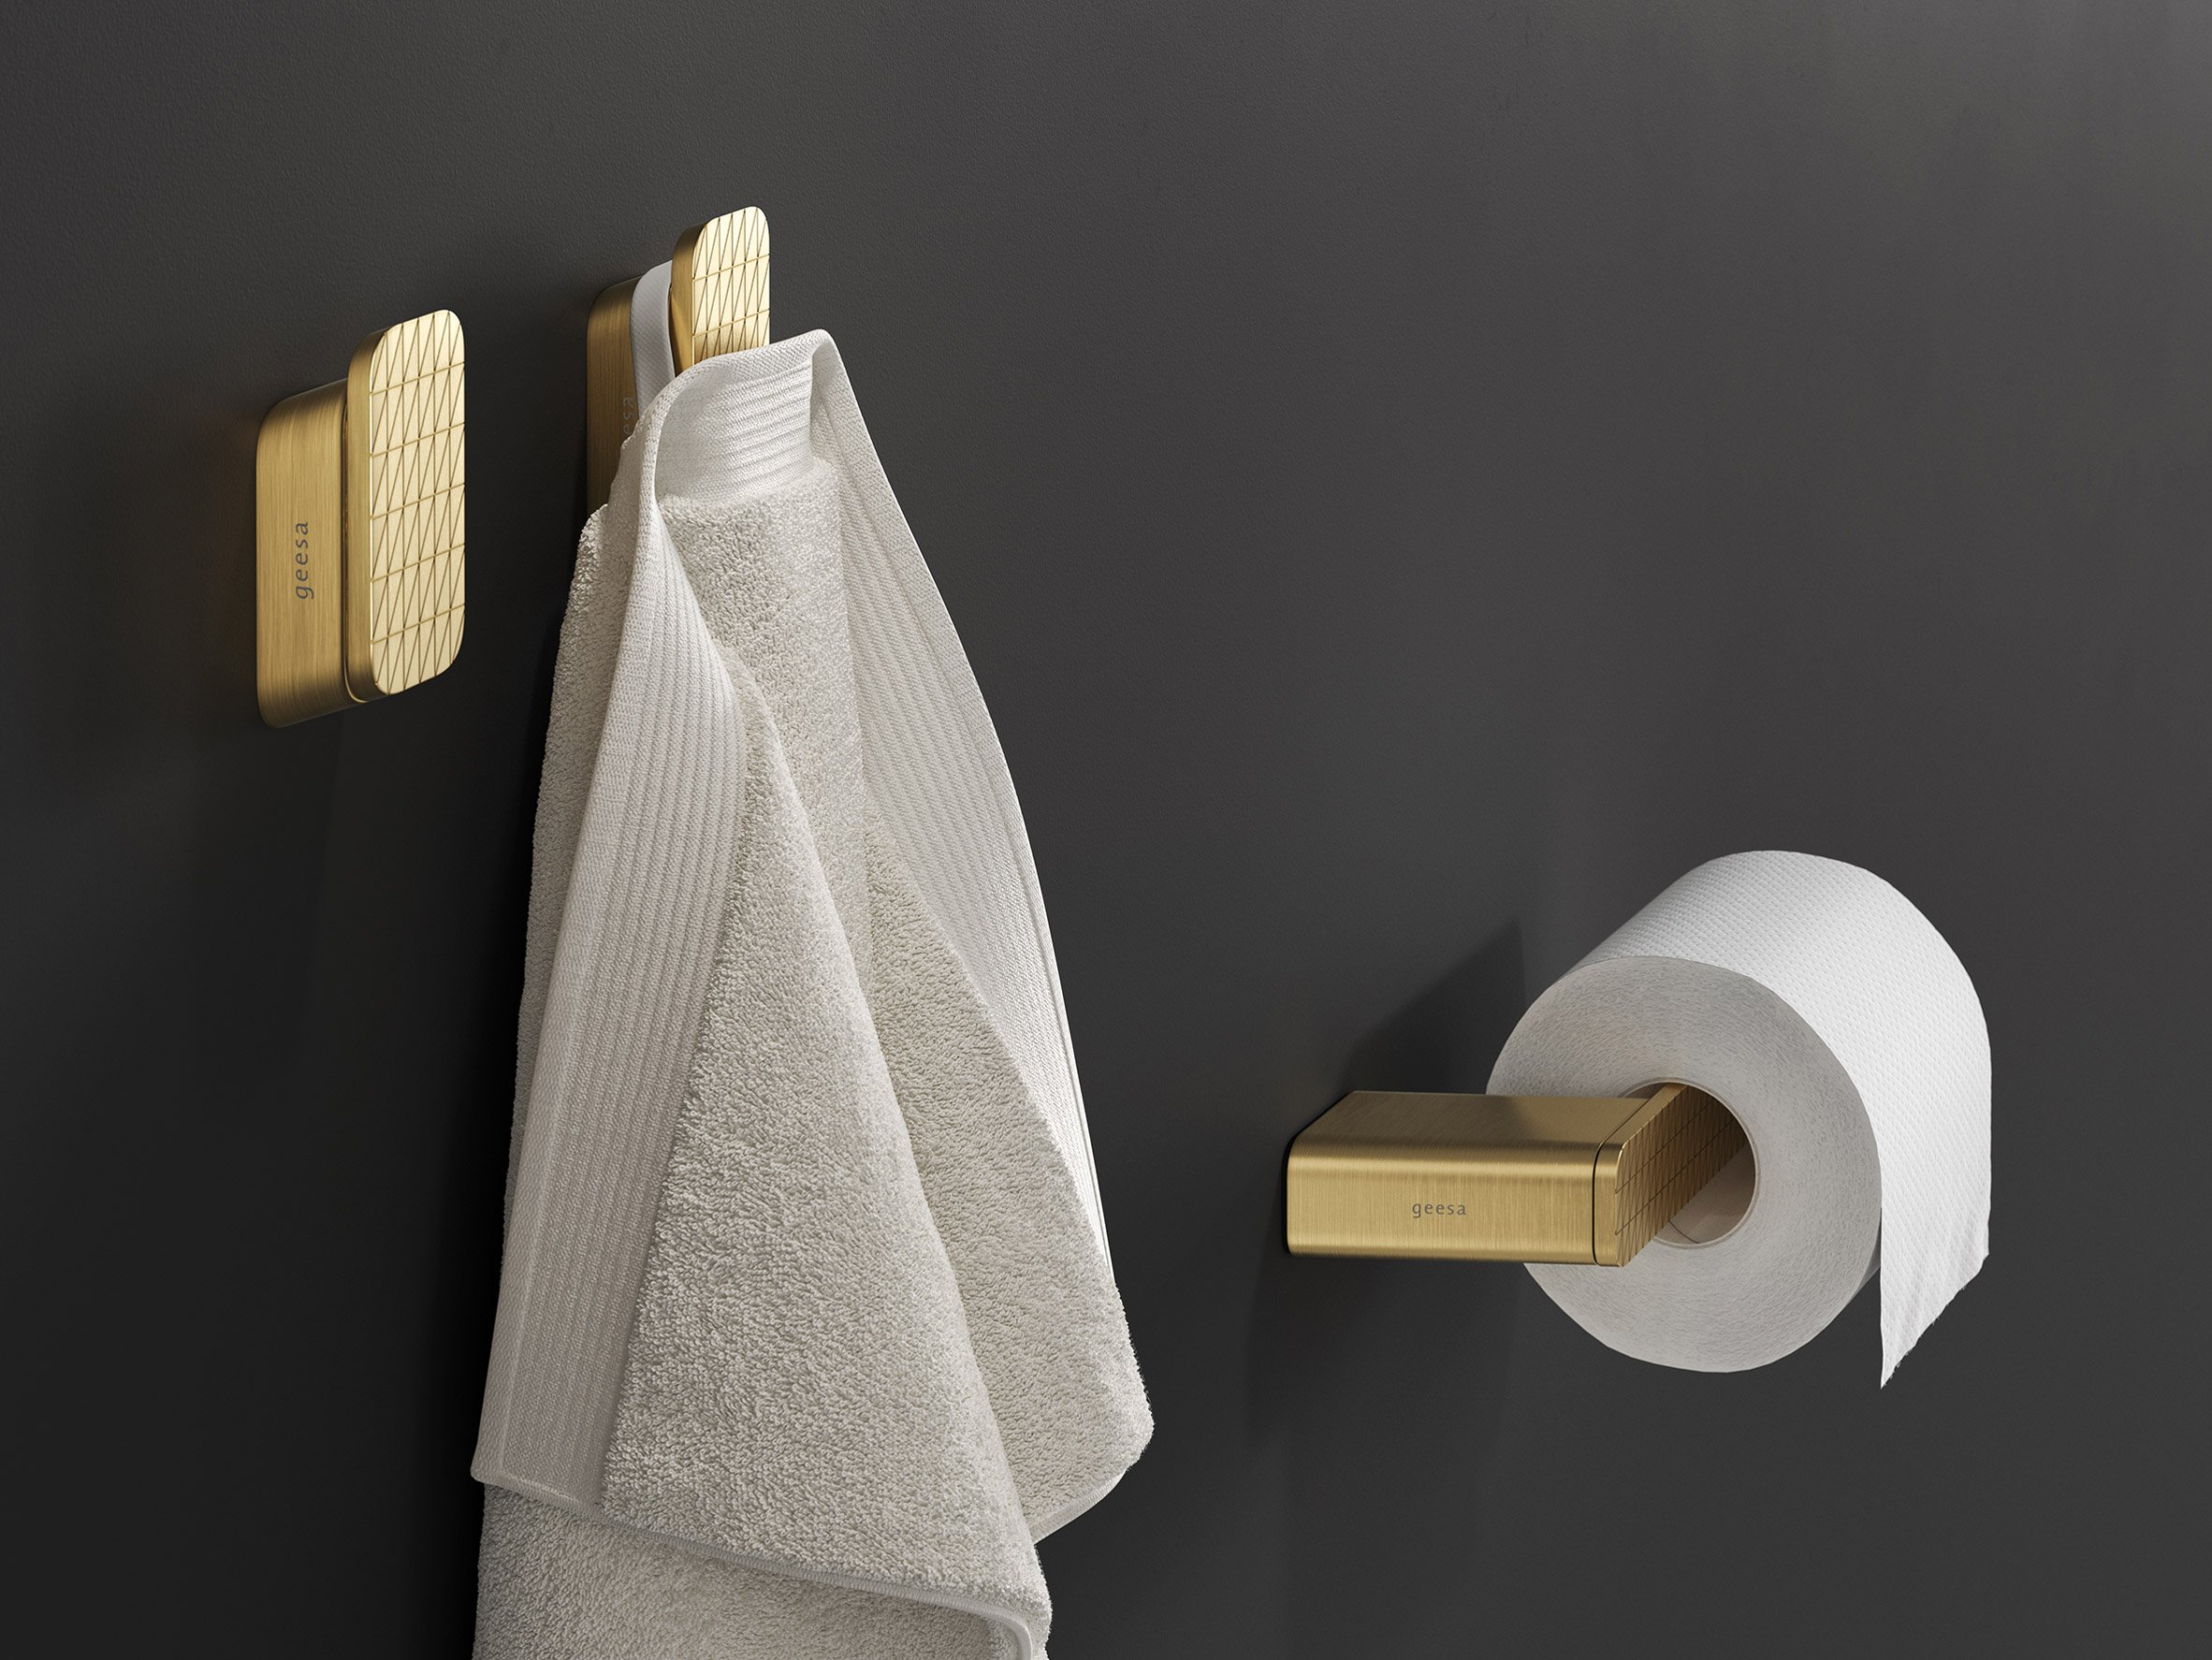 The Shift towel hook